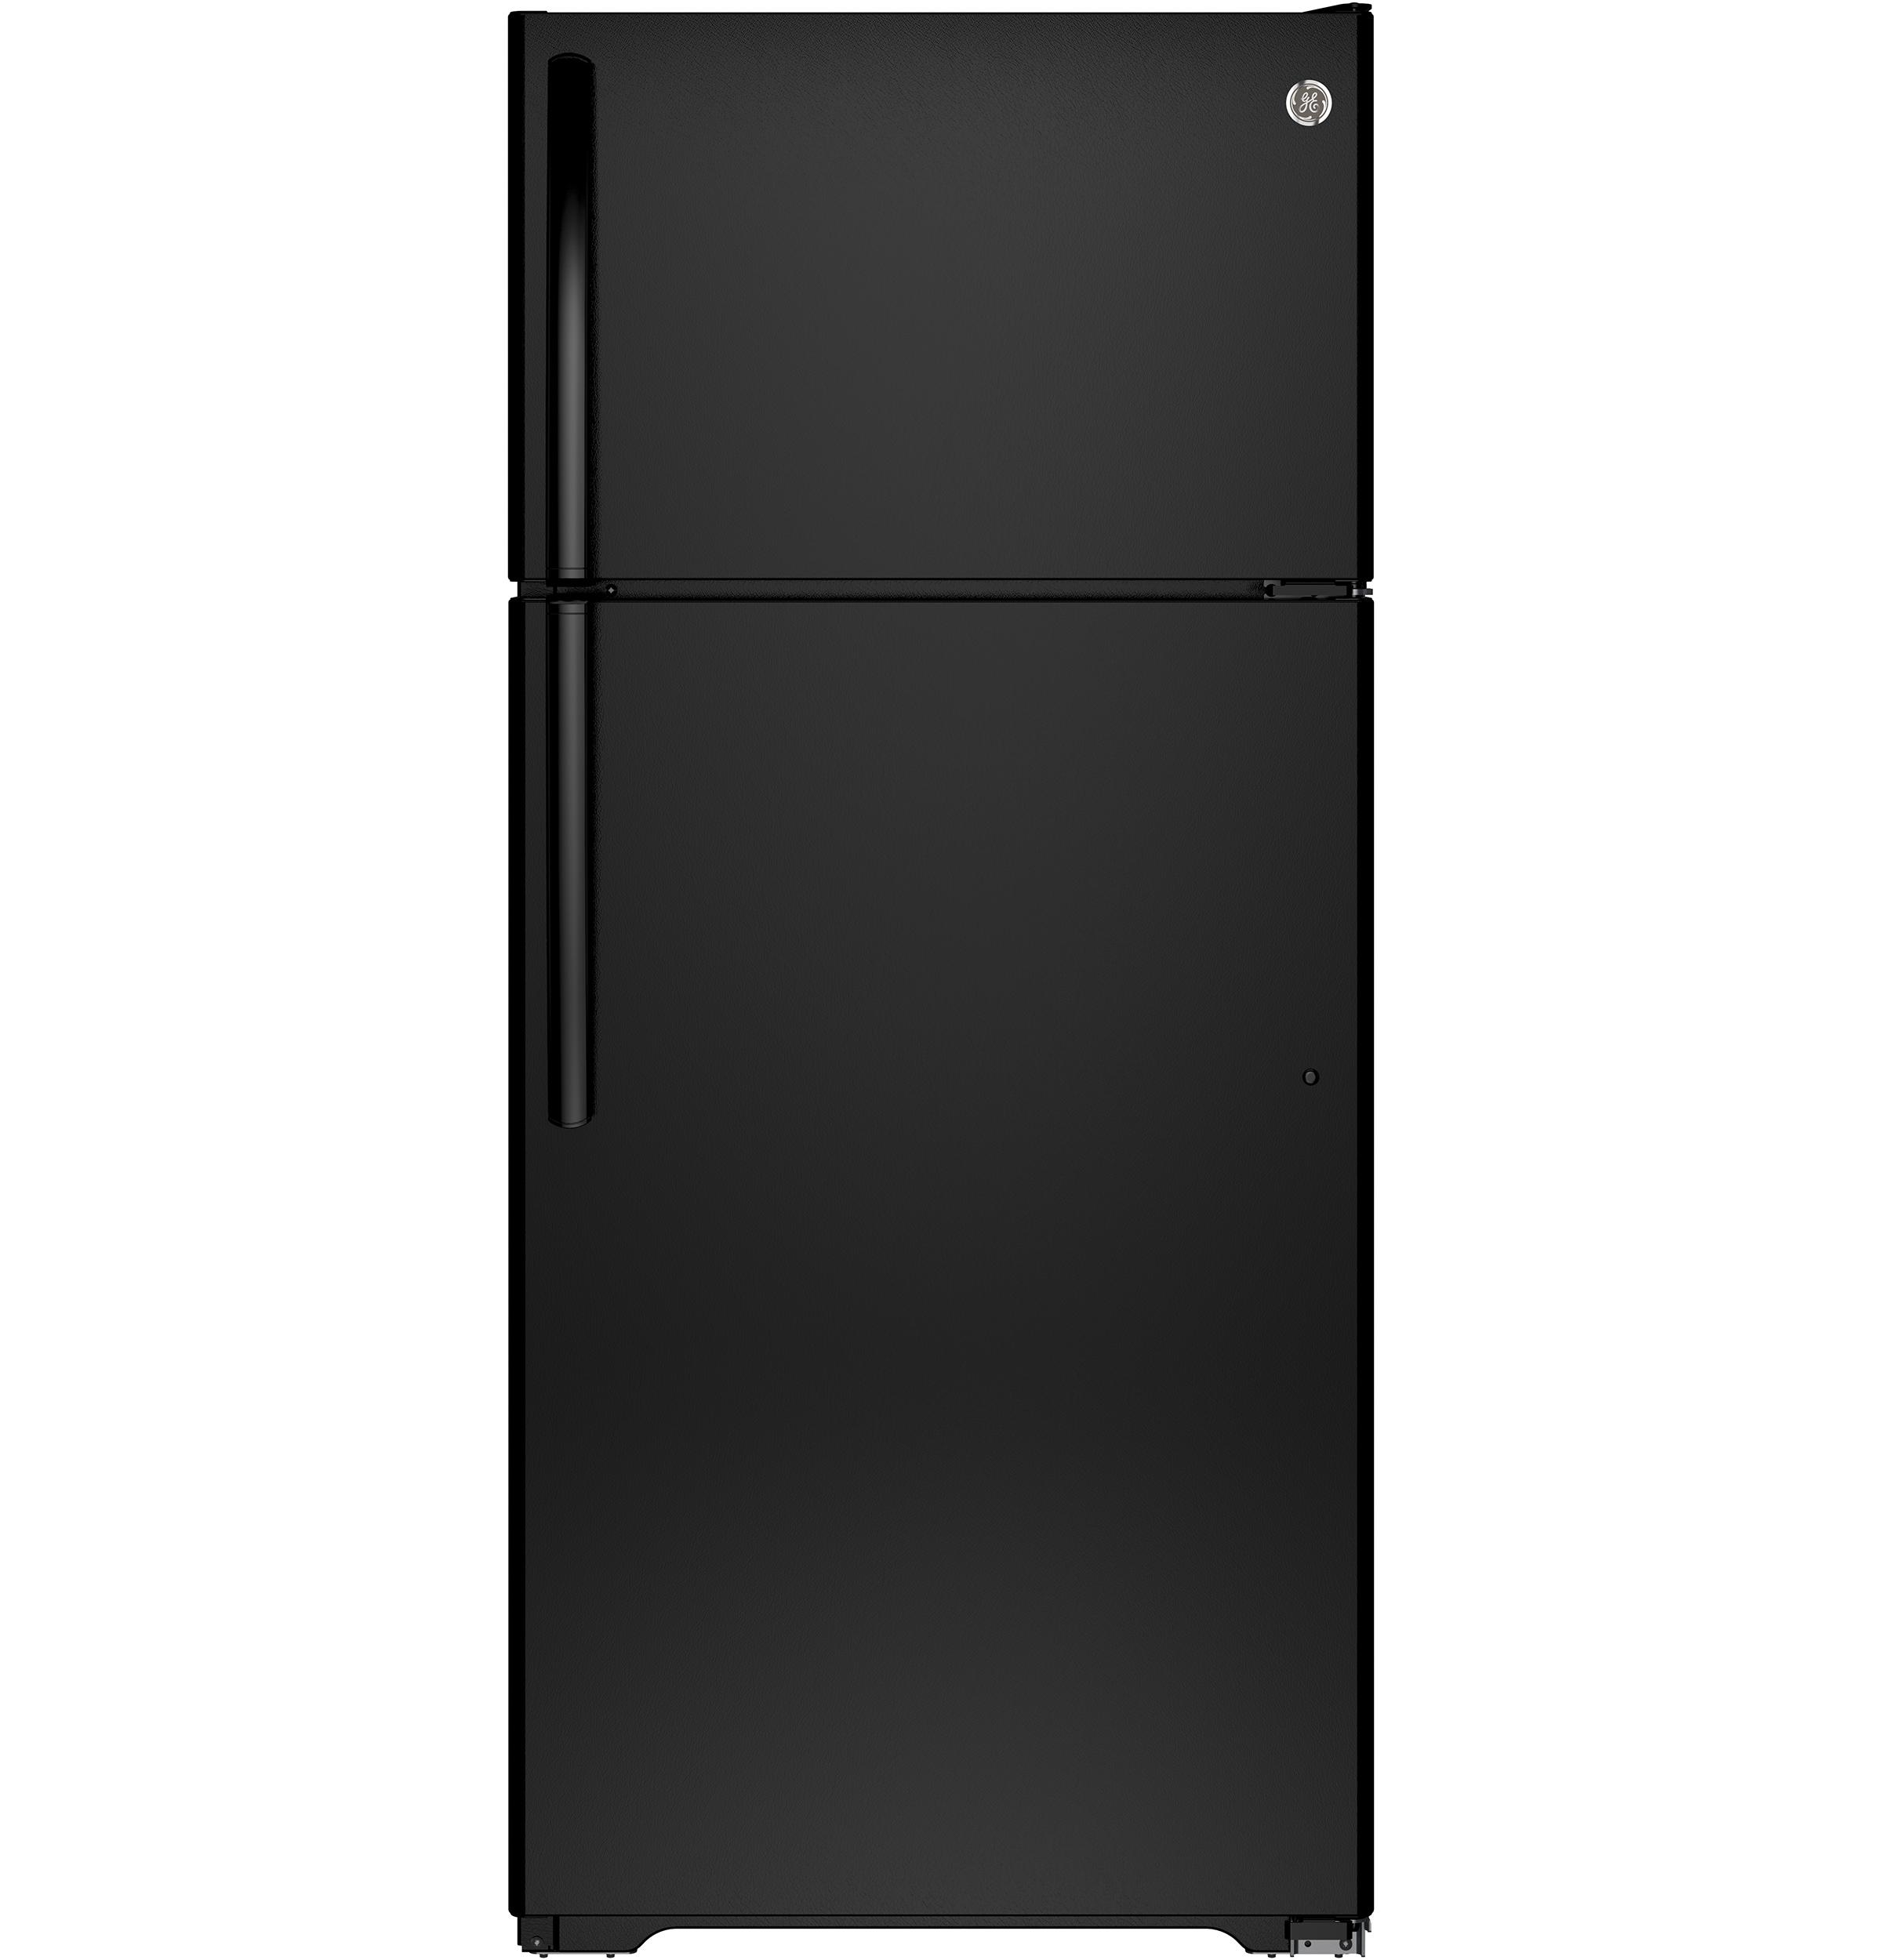 GE GE® ENERGY STAR® 15.5 Cu. Ft. Top-Freezer Refrigerator